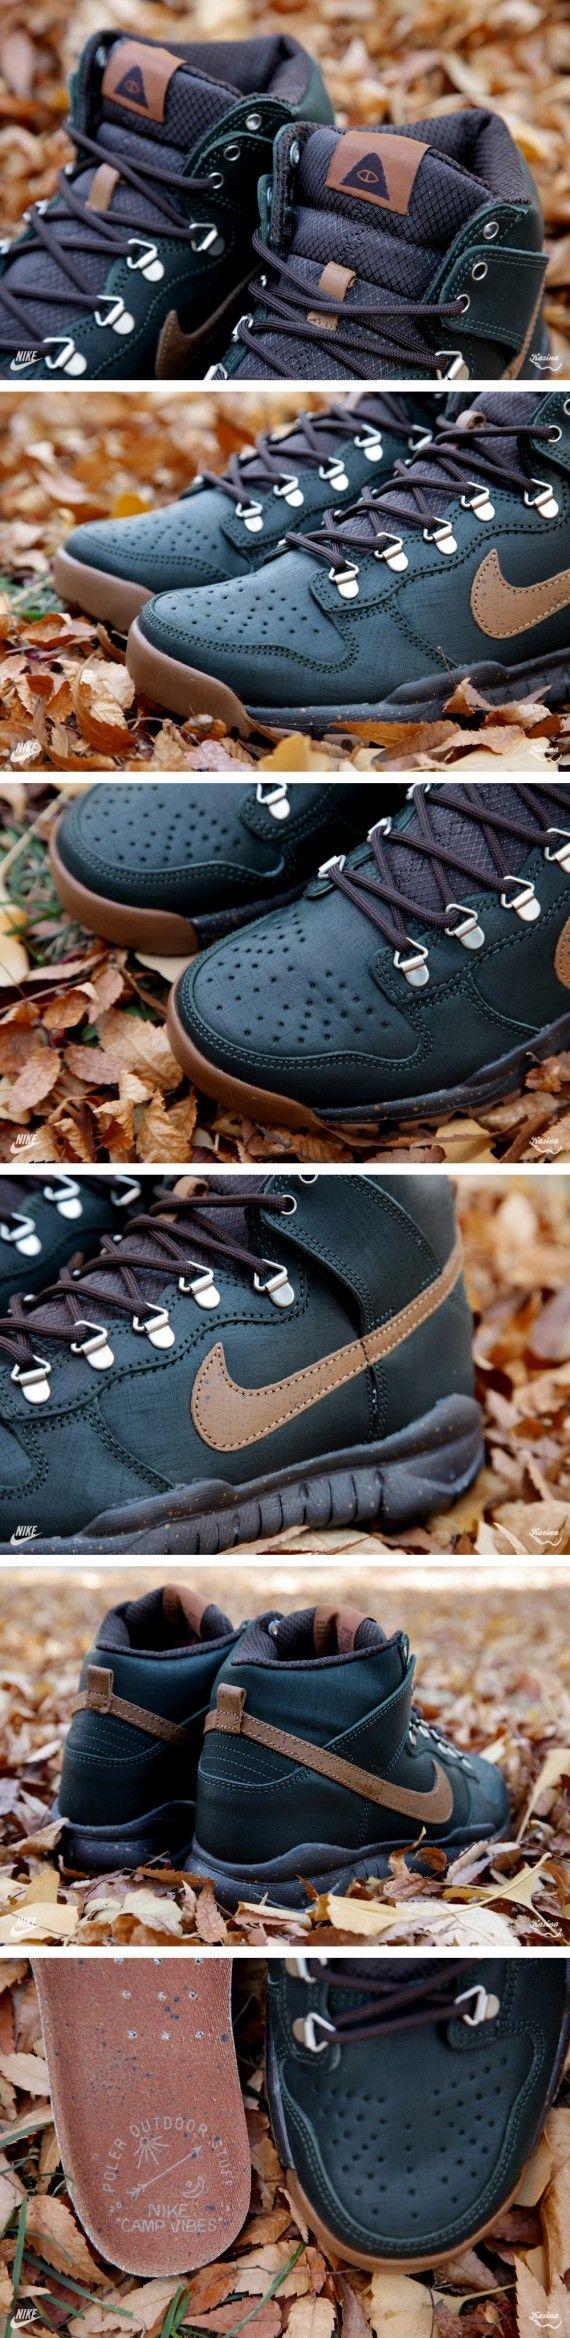 poler nike sb high oms 01 570x2338 Poler x Nike Dunk High OMS   Black Spruce   Classic Brown